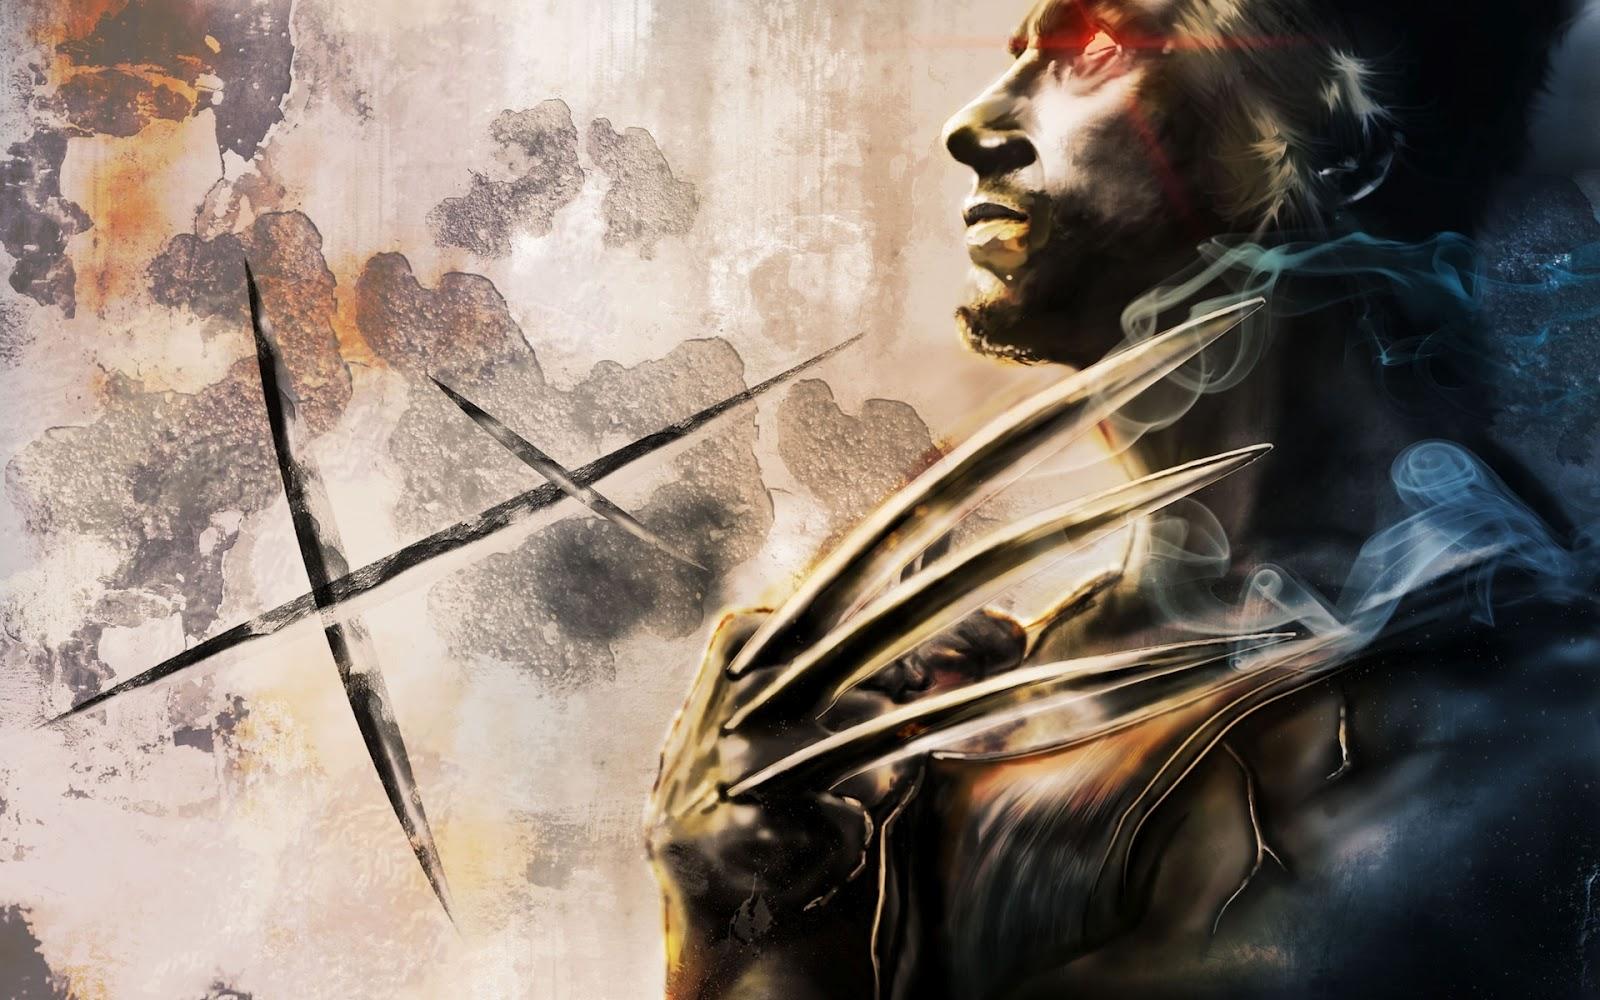 AAAAAAAAerI5QUPVmRtYo8s1600X Men Wolverine Anime HD Wallpapersjpg 1600x1000